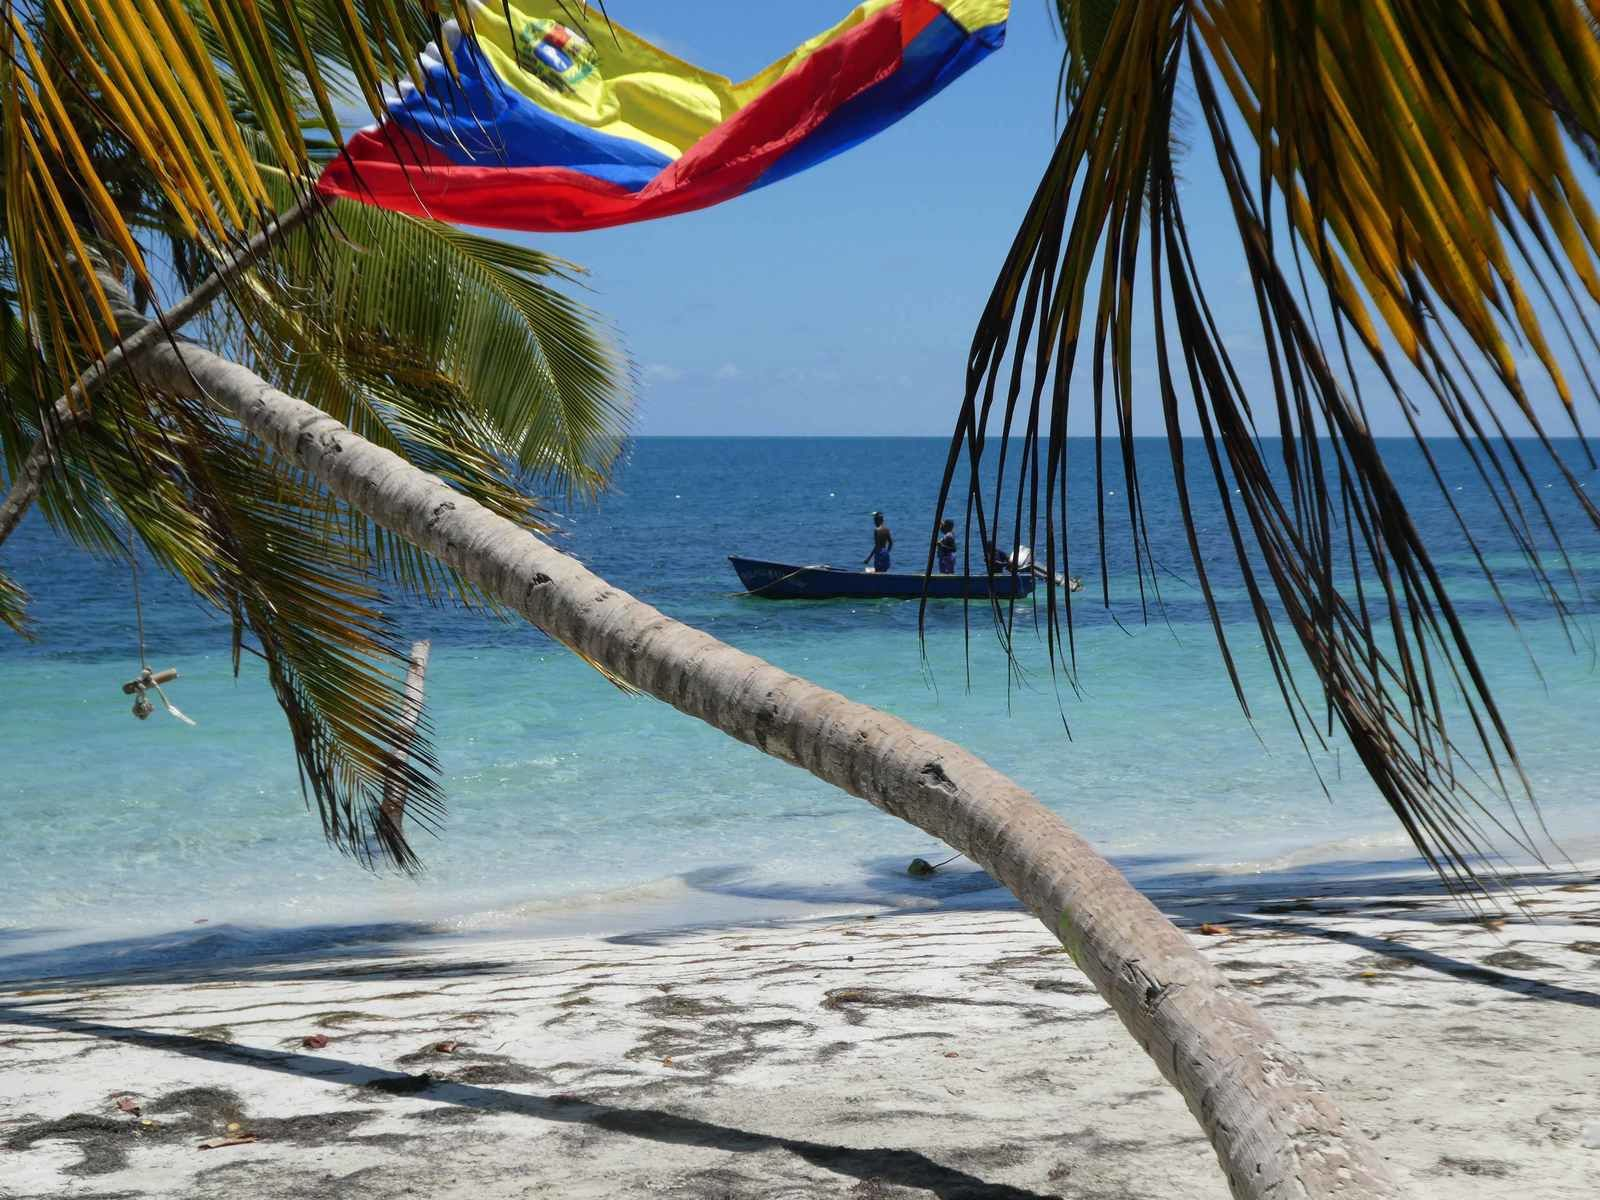 Bahia Manzanillo